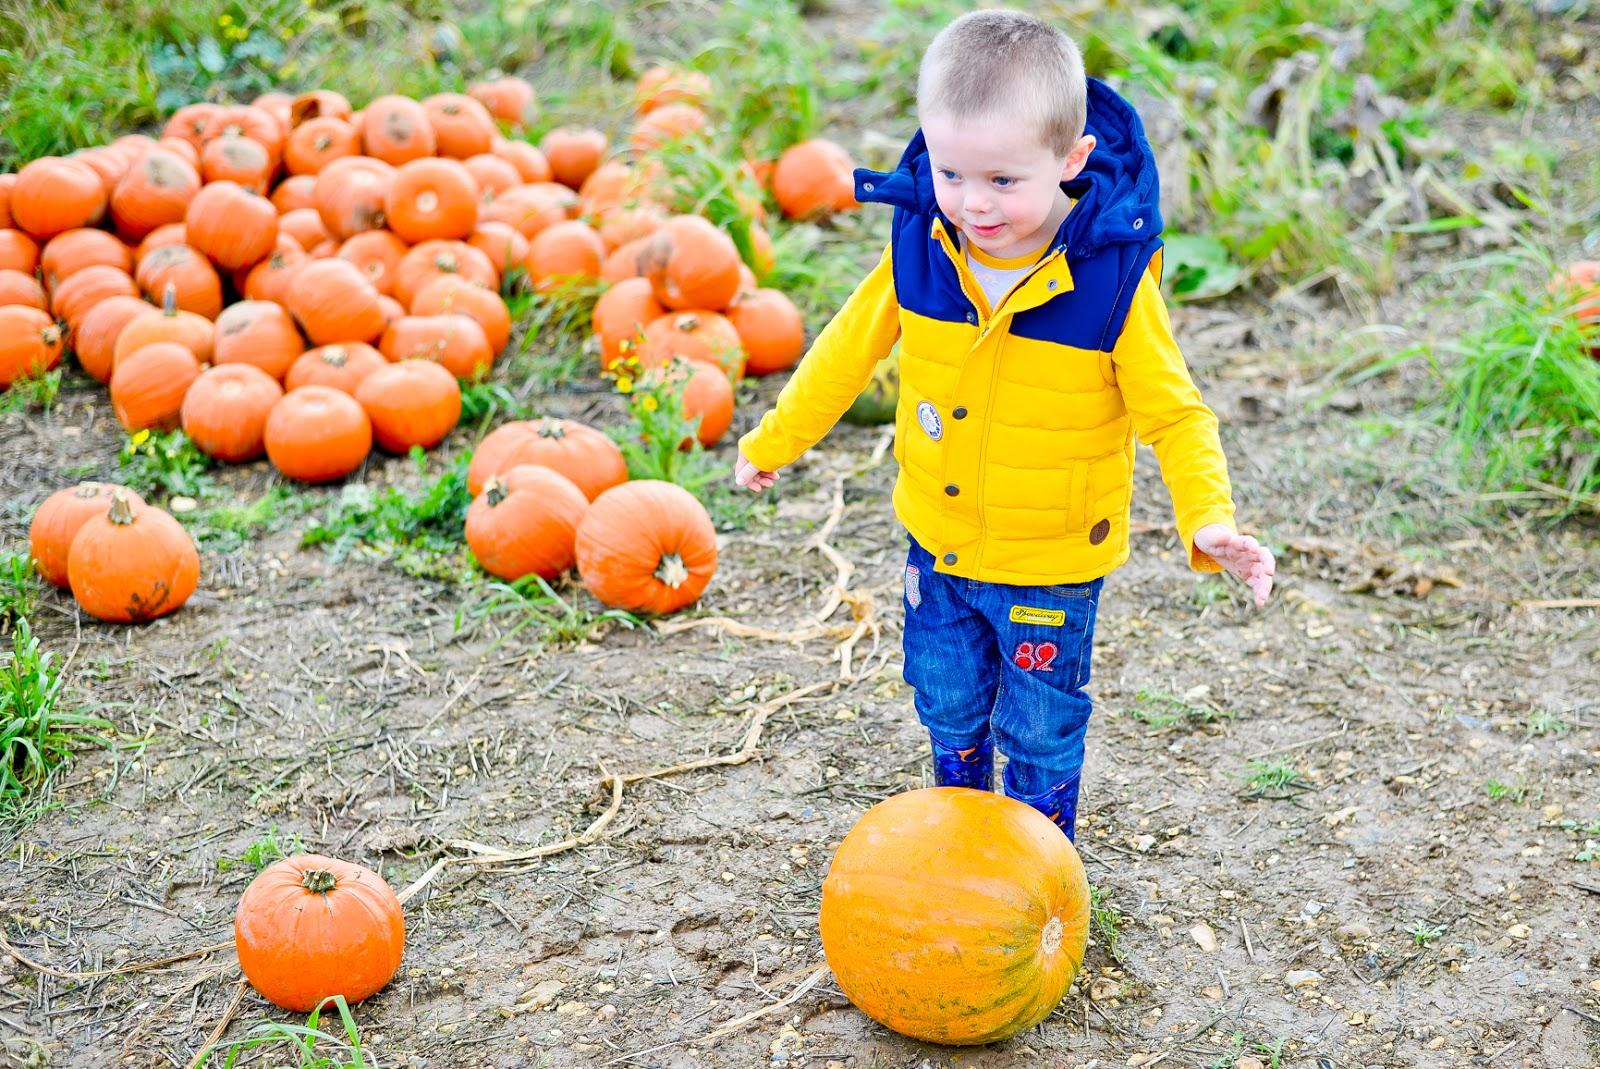 pick your own pumpkin patch, pop up farm st albans, pop up farm pumpkins st albans, pumpkin picking, pumpkin patch,